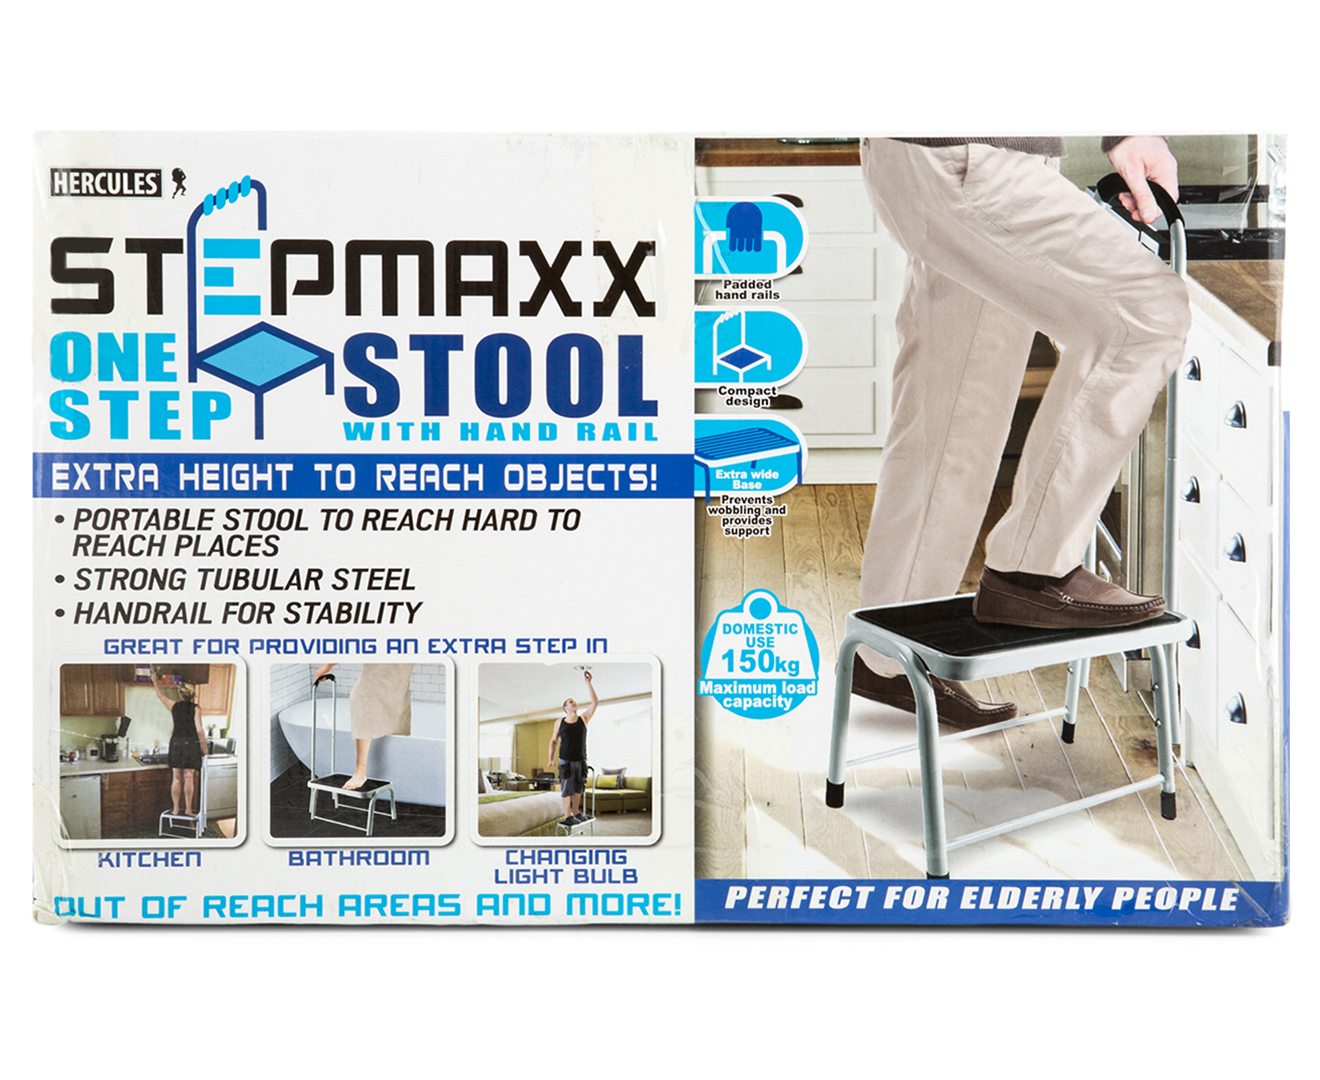 Hercules Stepmaxx One Step Stool w/ Rail - White